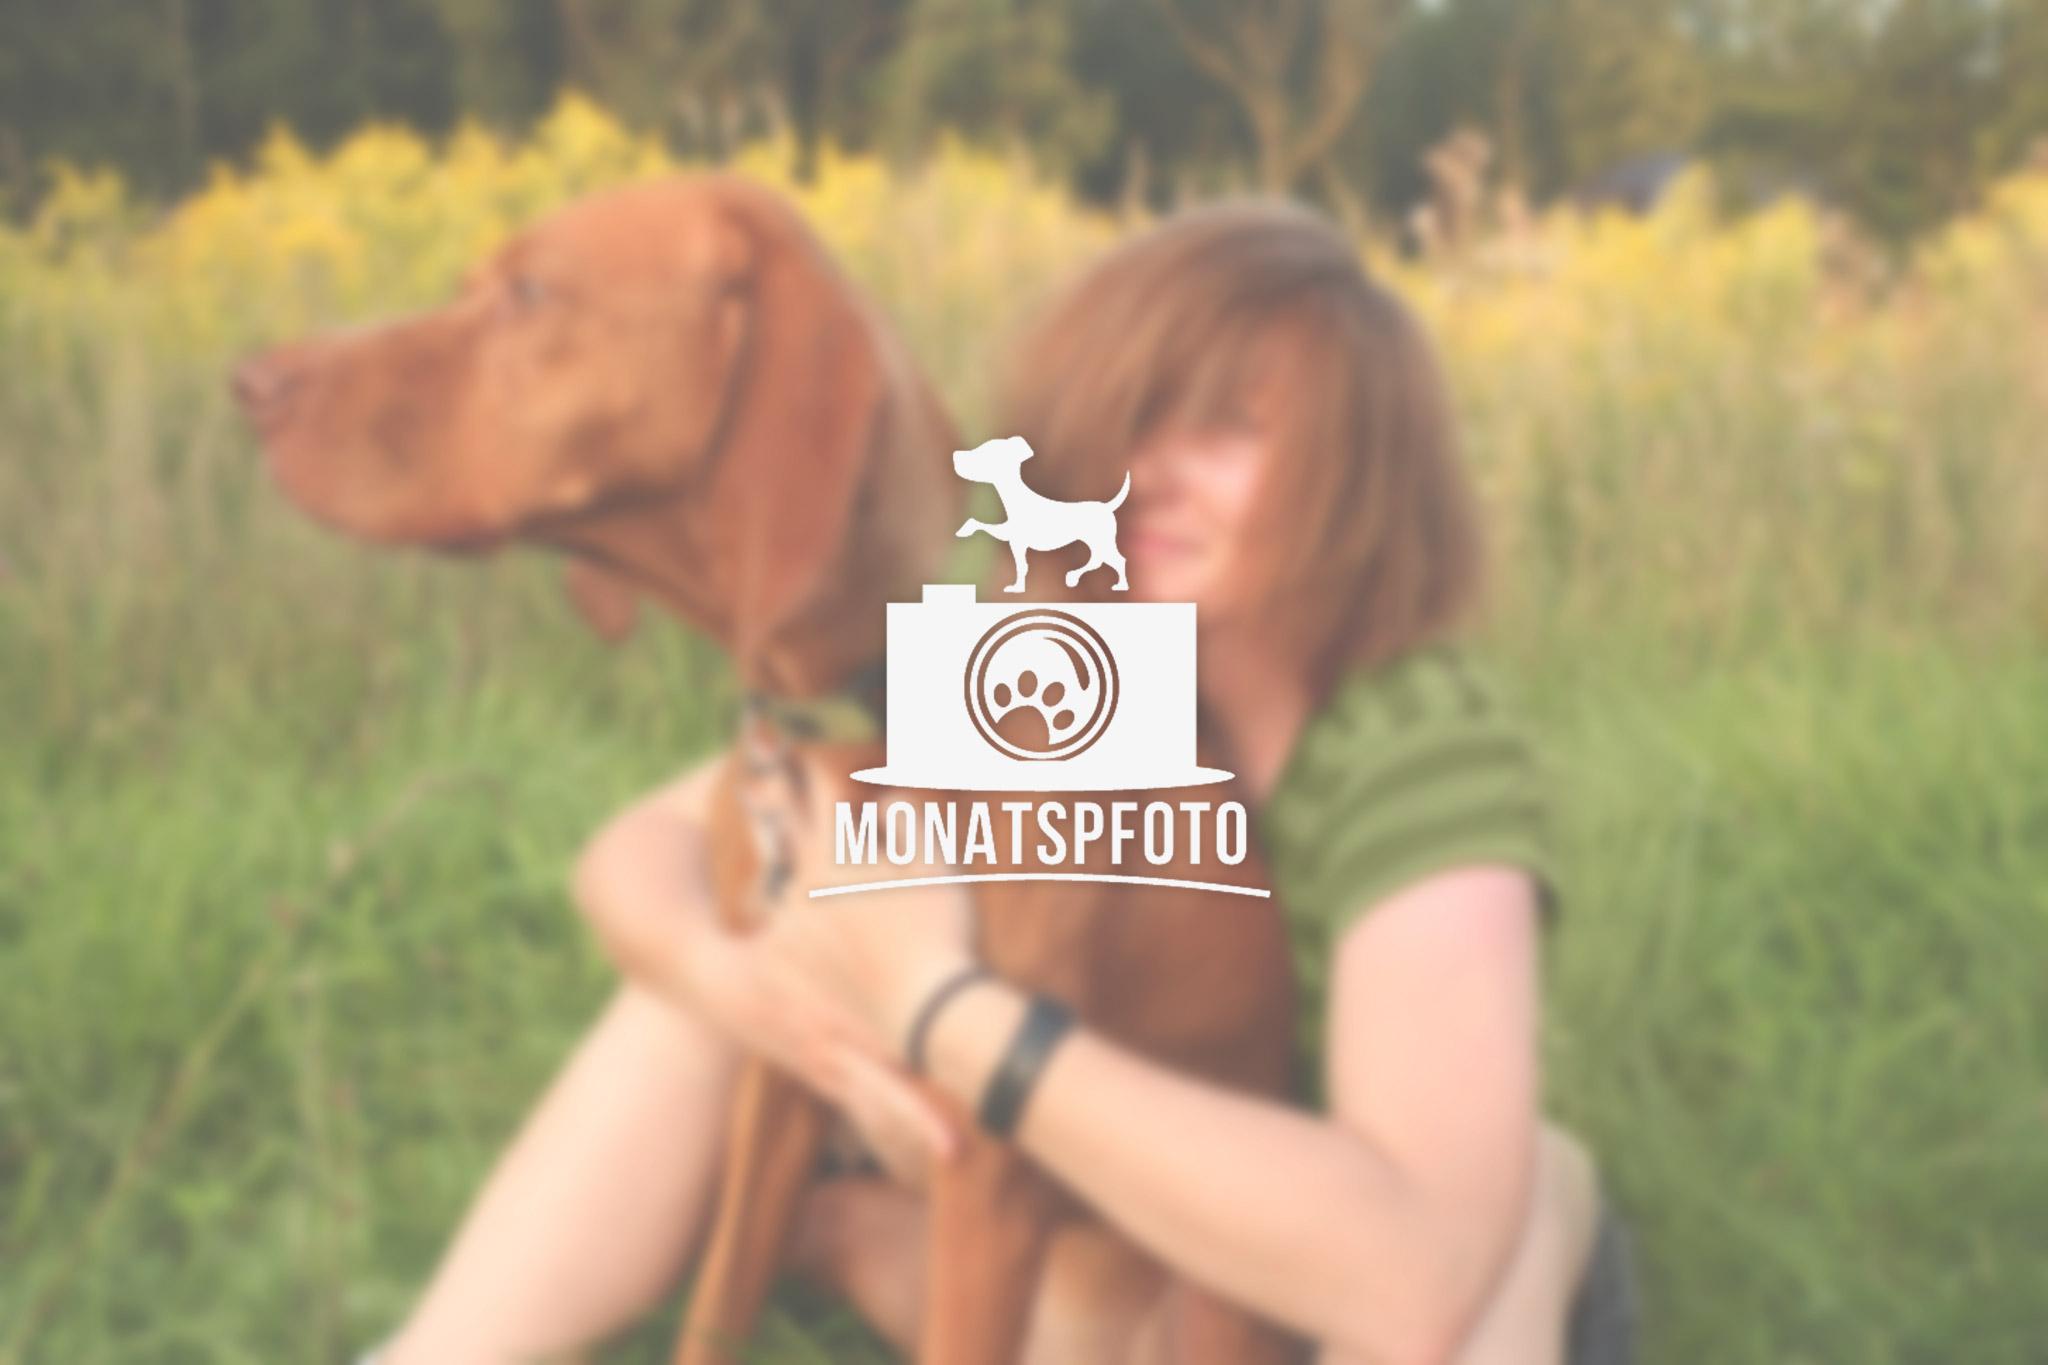 monatspfoto_teaser_08-2015